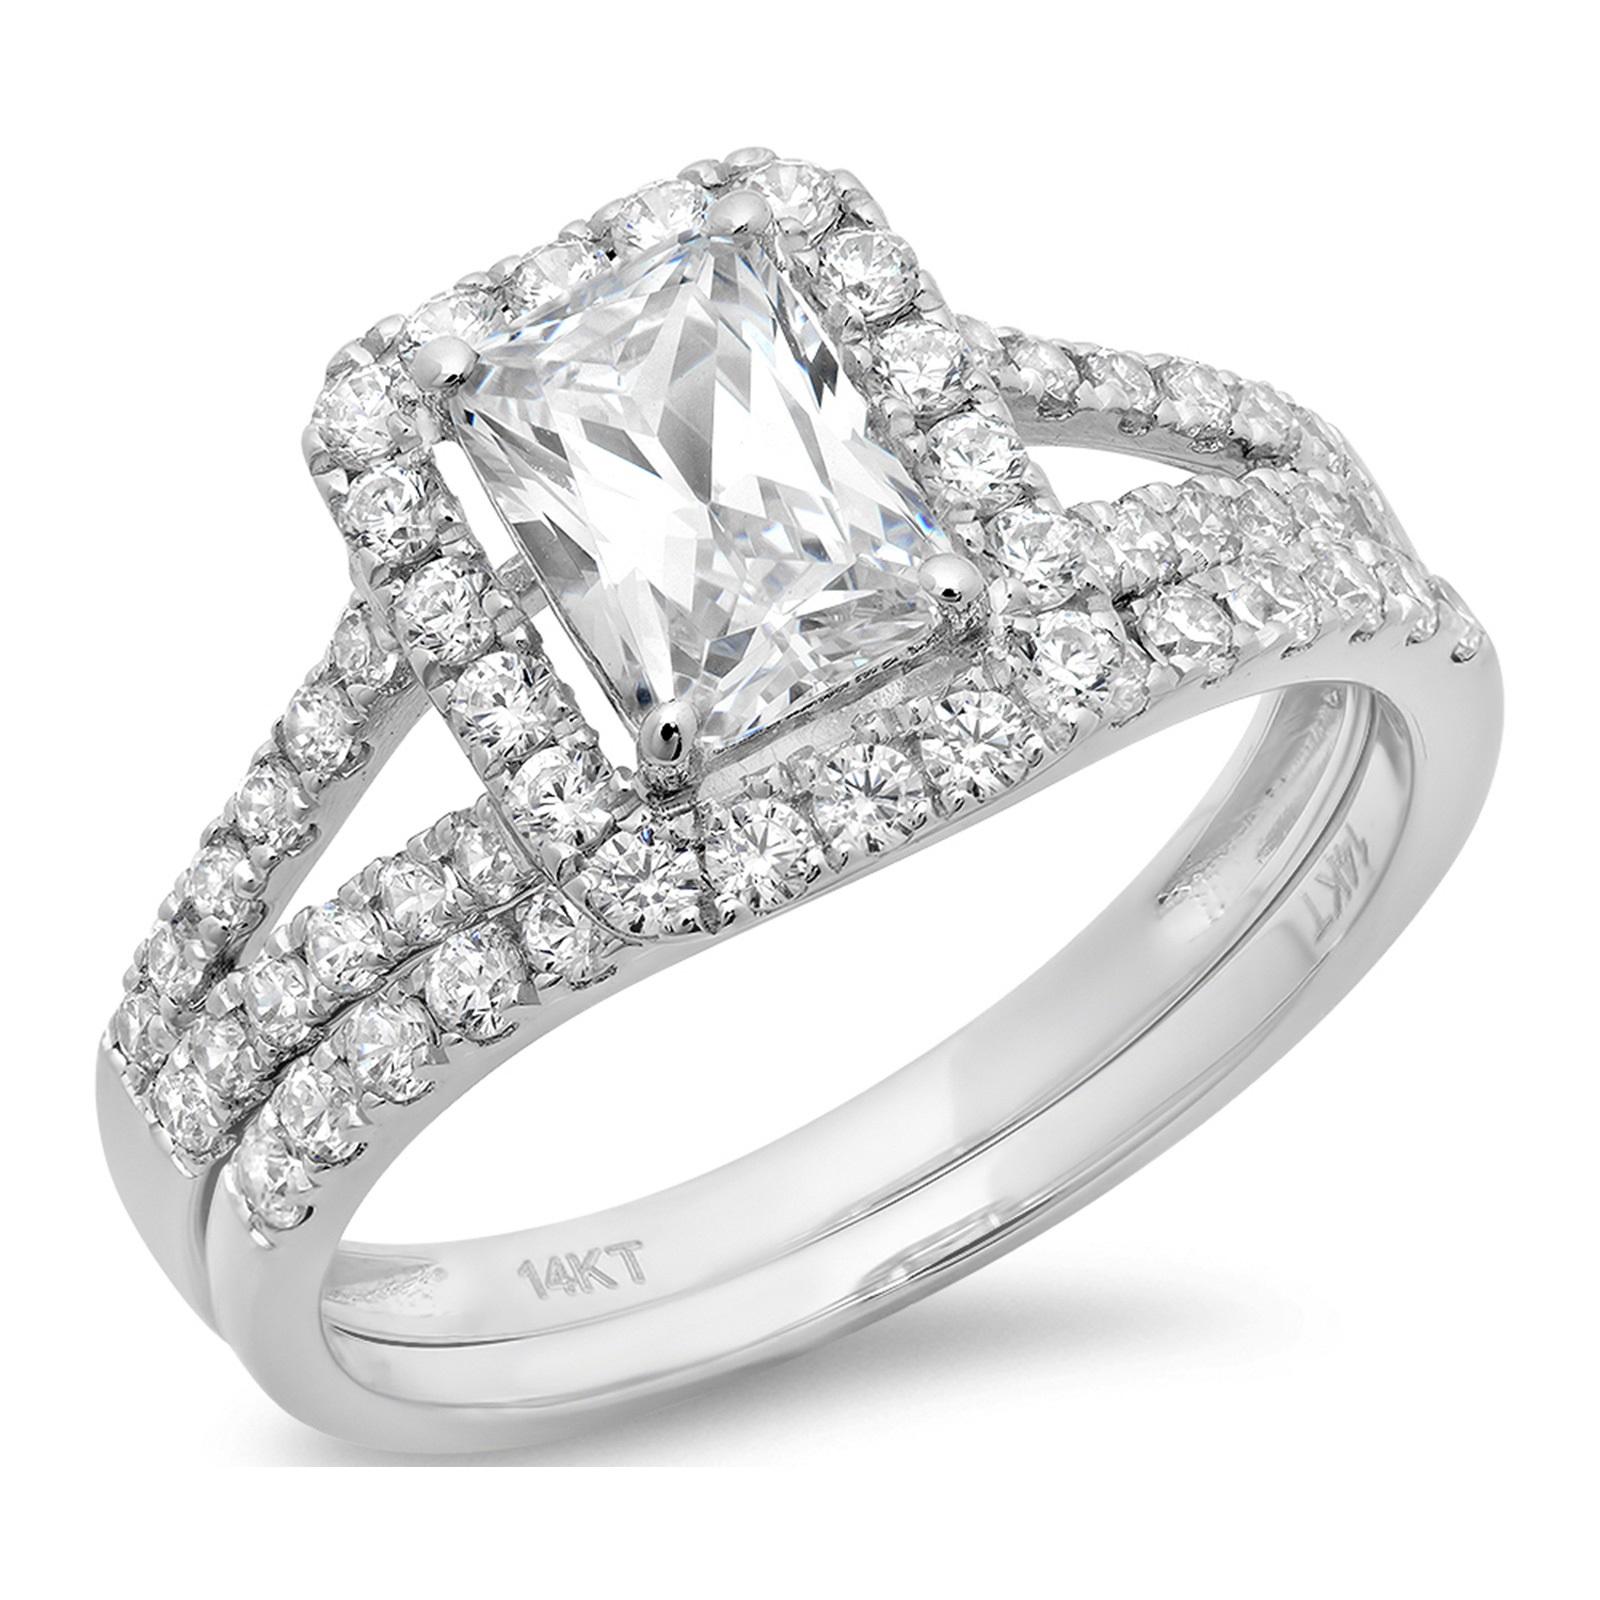 1.60 CT Emerald Cut Sim Diamond CZ Pave Halo Bridal Engag...